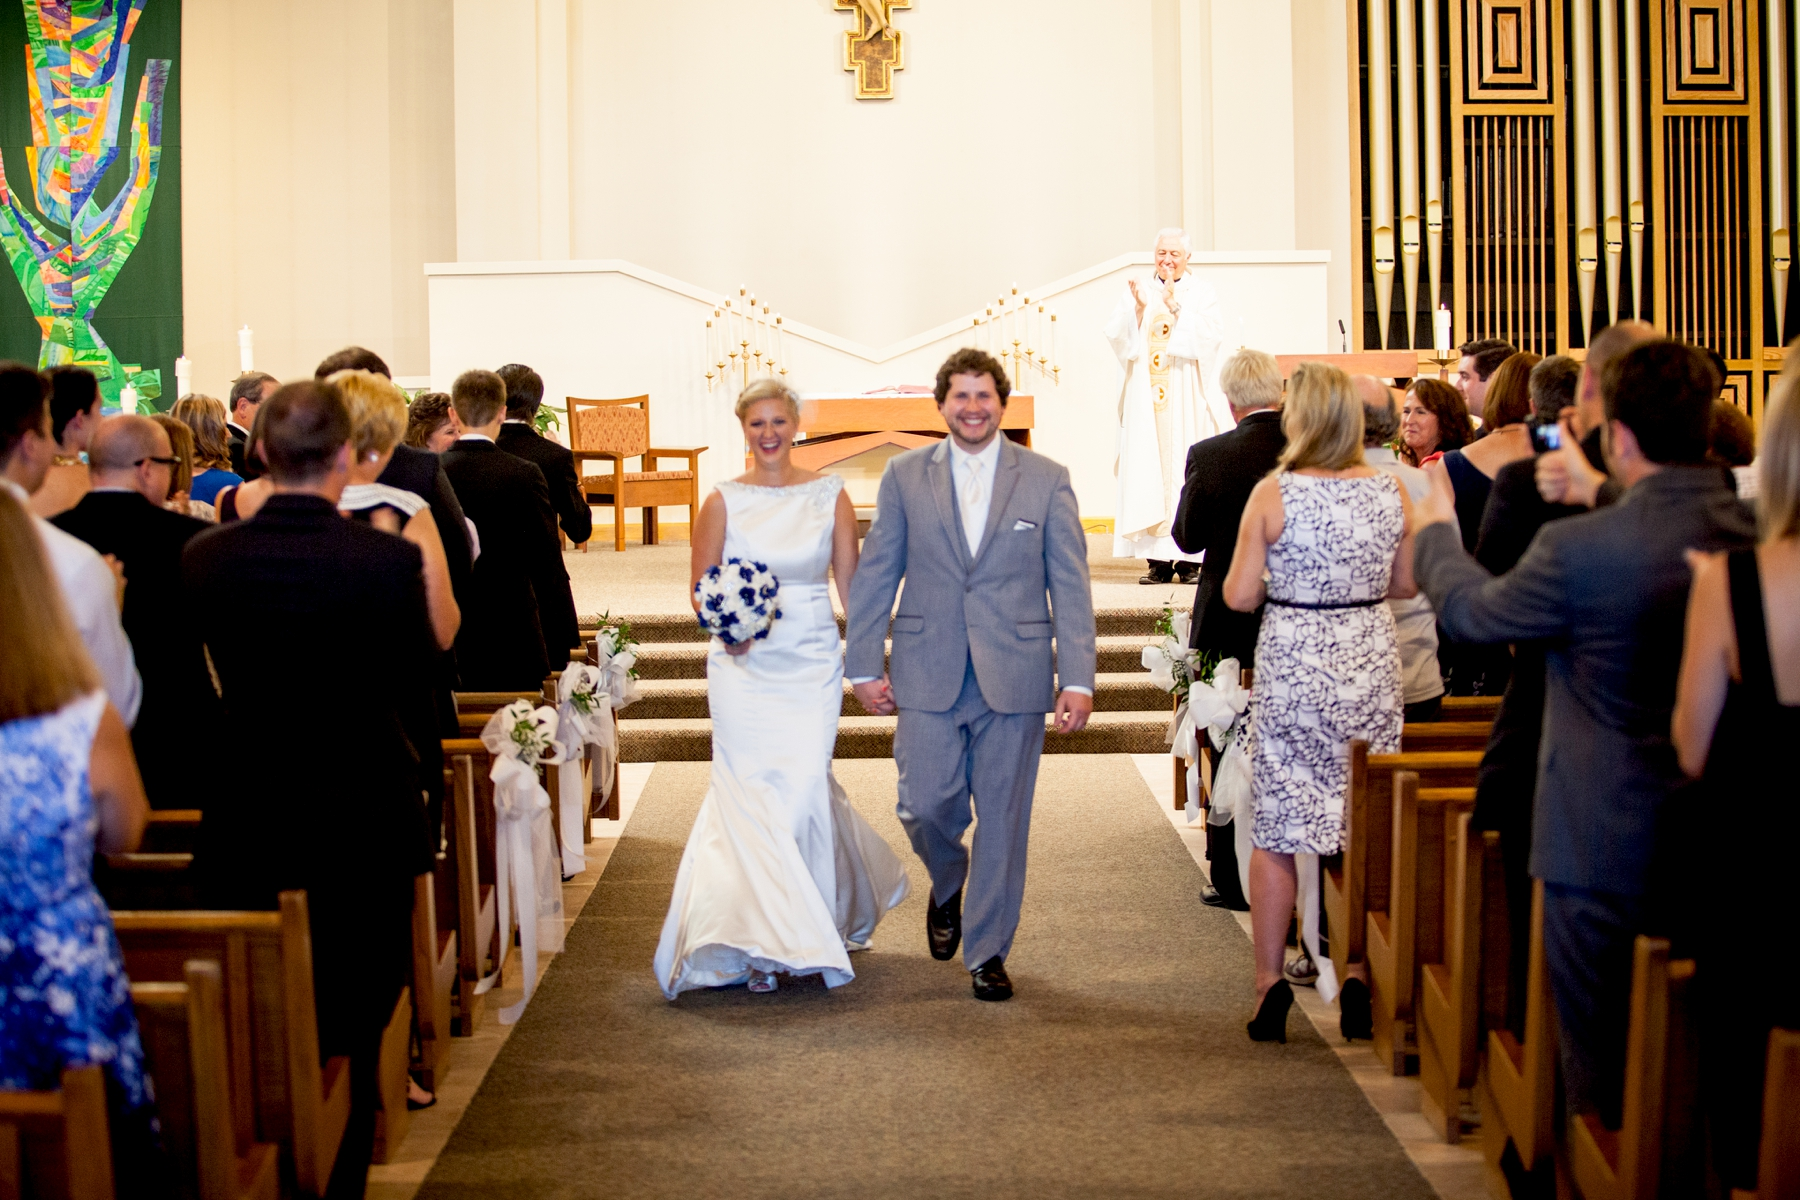 Brandon_Shafer_Photography_Chris_Lauren_Michigan_State_Capital_Wedding_0026.jpg